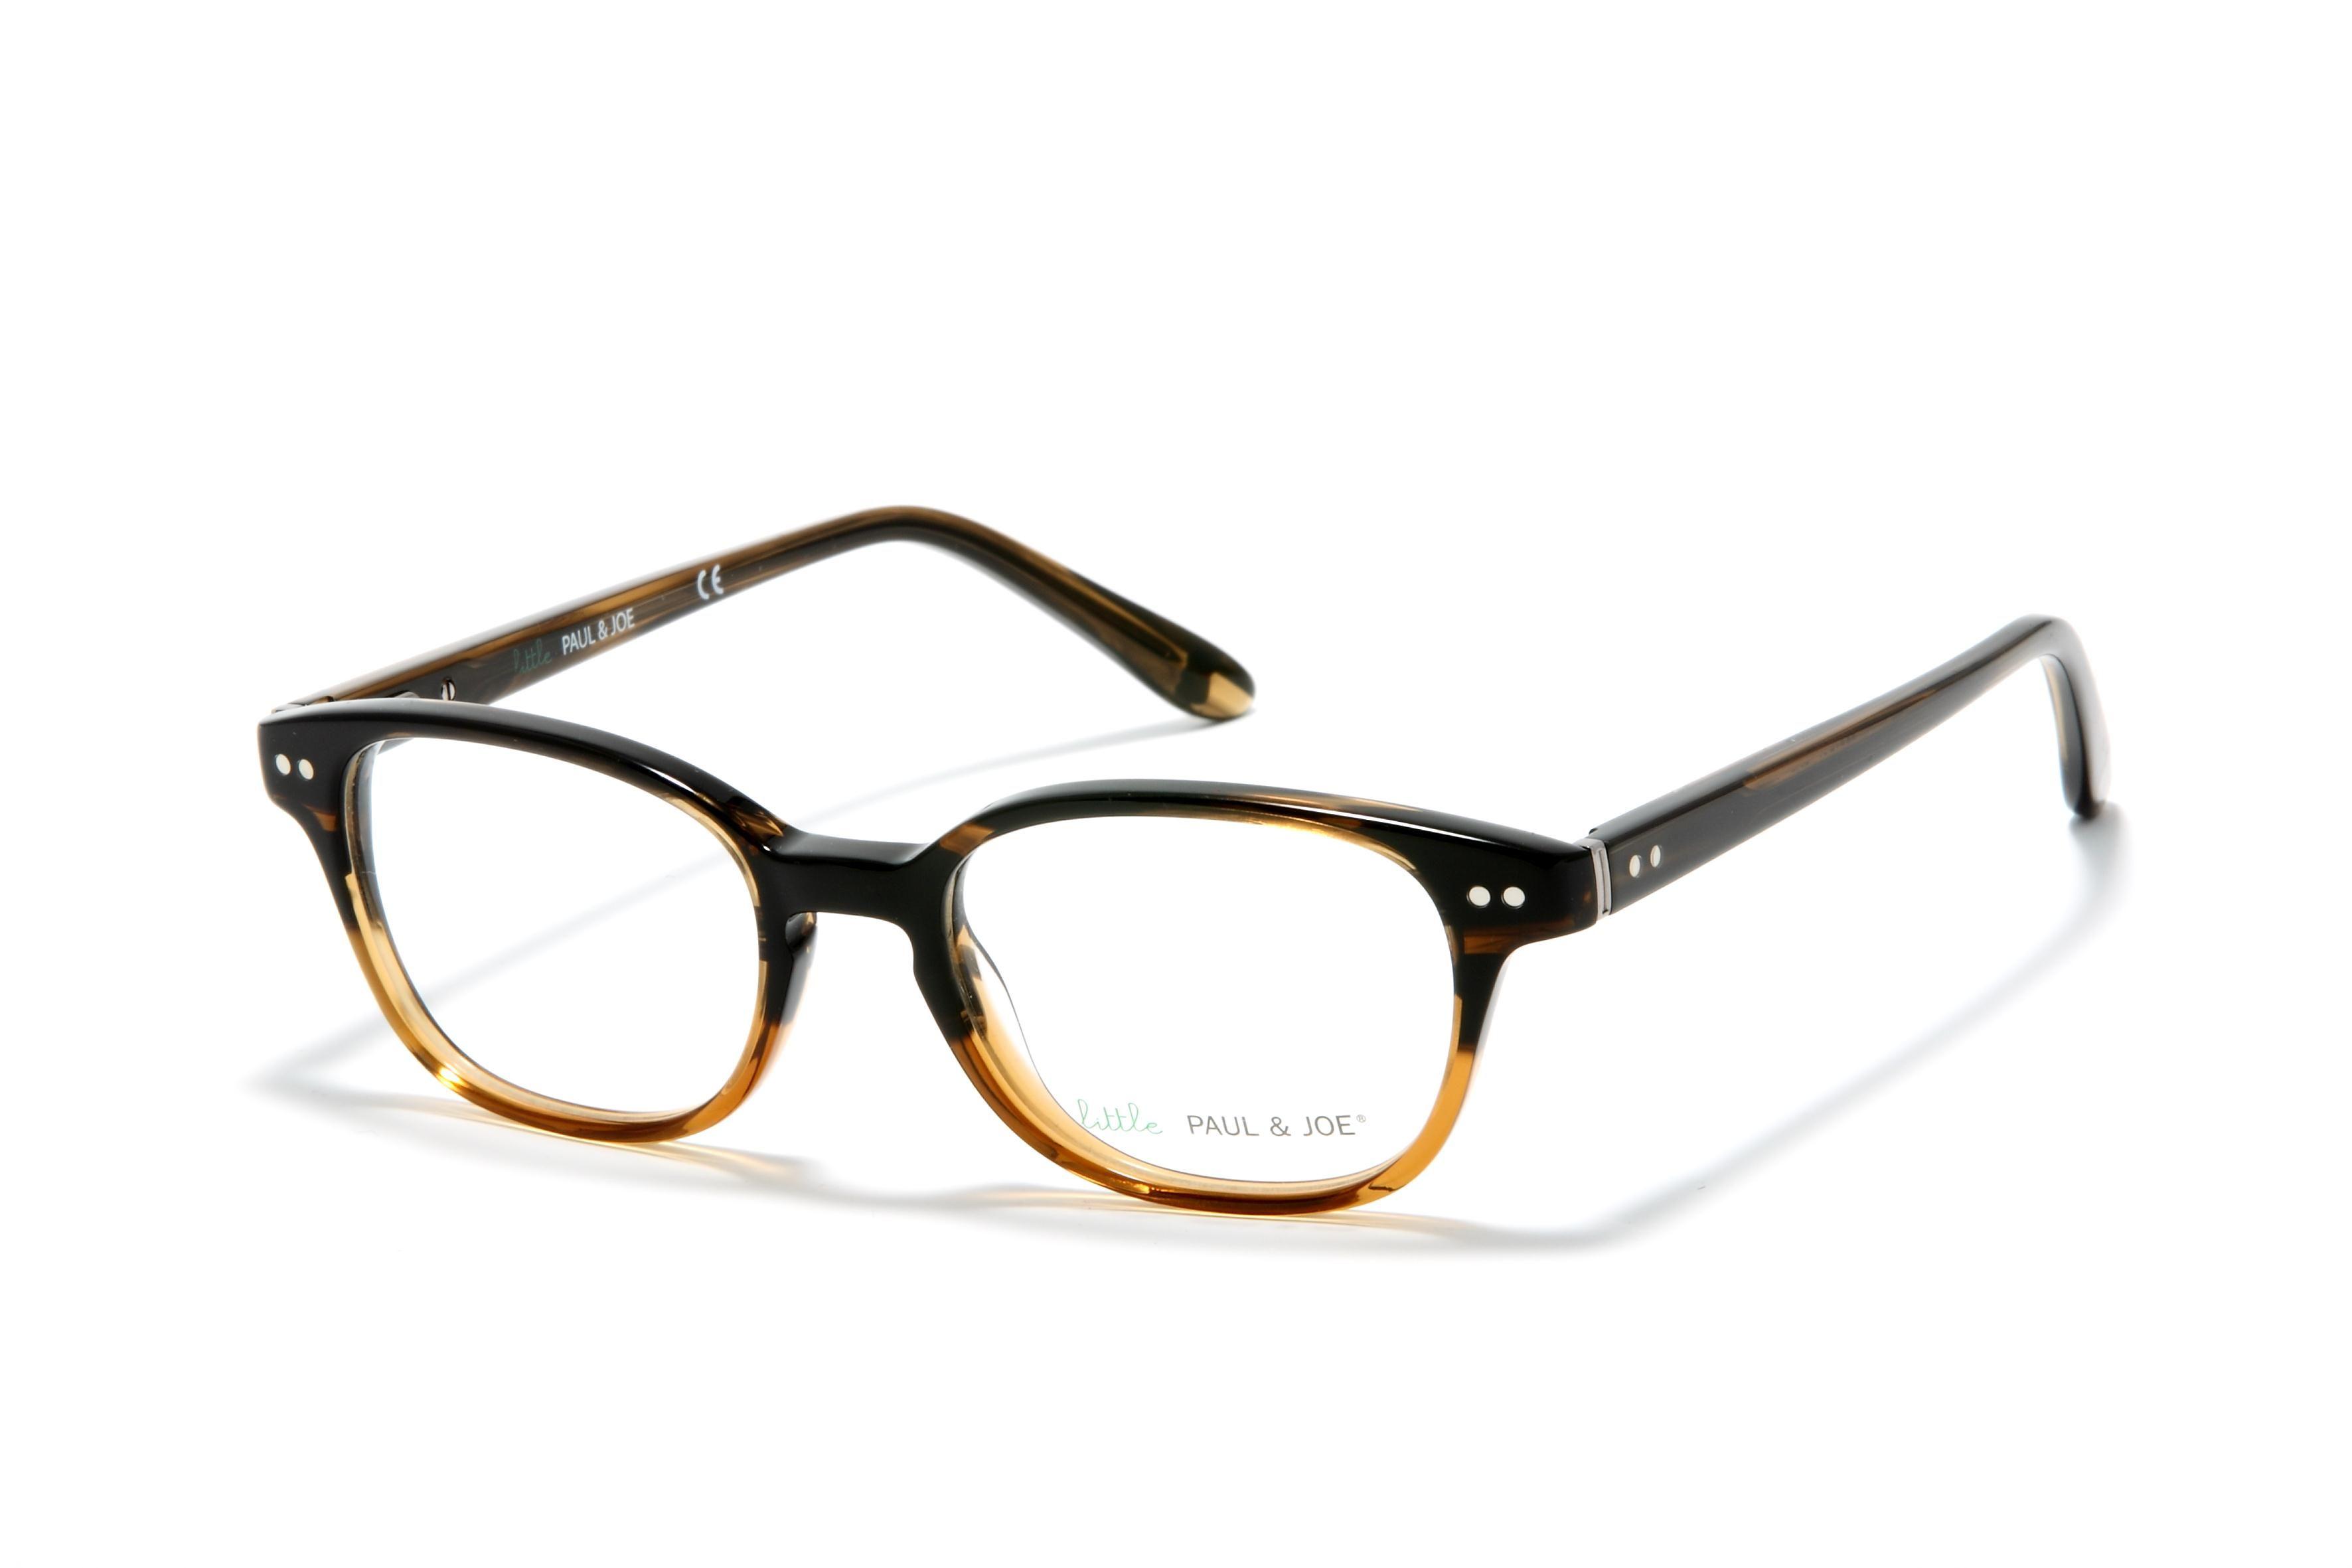 3112566c7f741f Lunettes Little Paul and Joe   lunnette   Optician, Paul, joe et Glasses